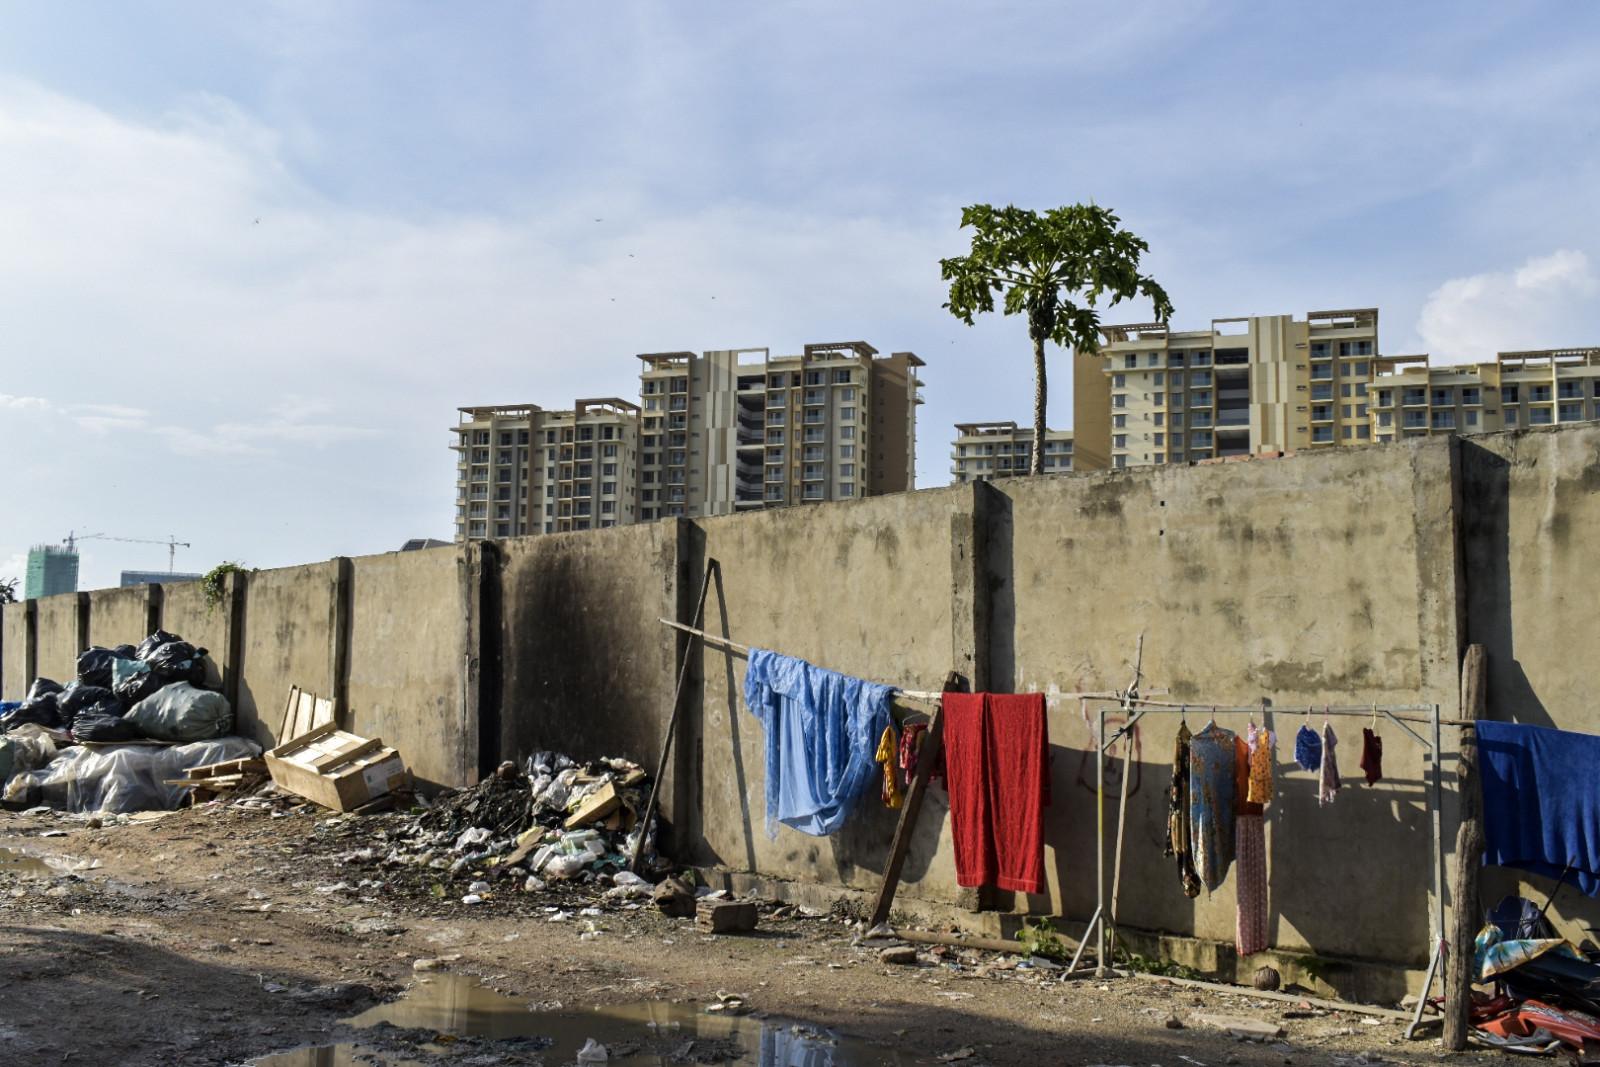 Phnom Penh city walls with garbage